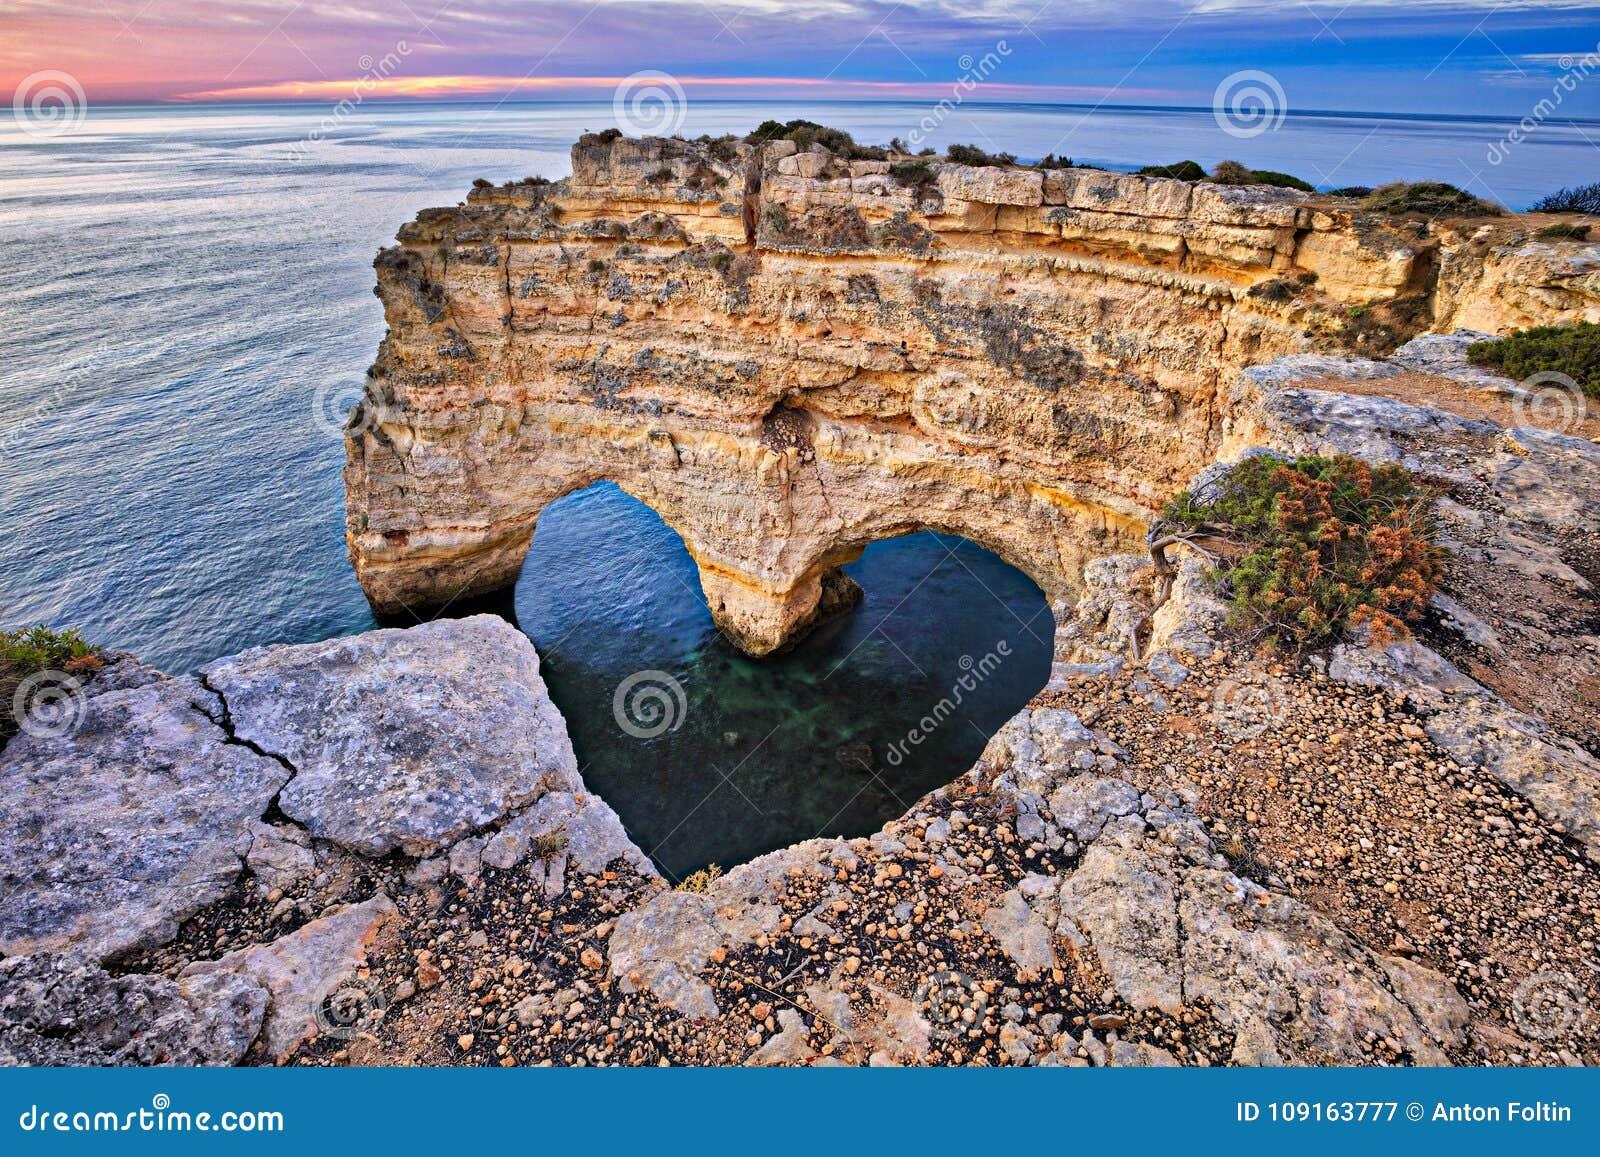 Heart Arch